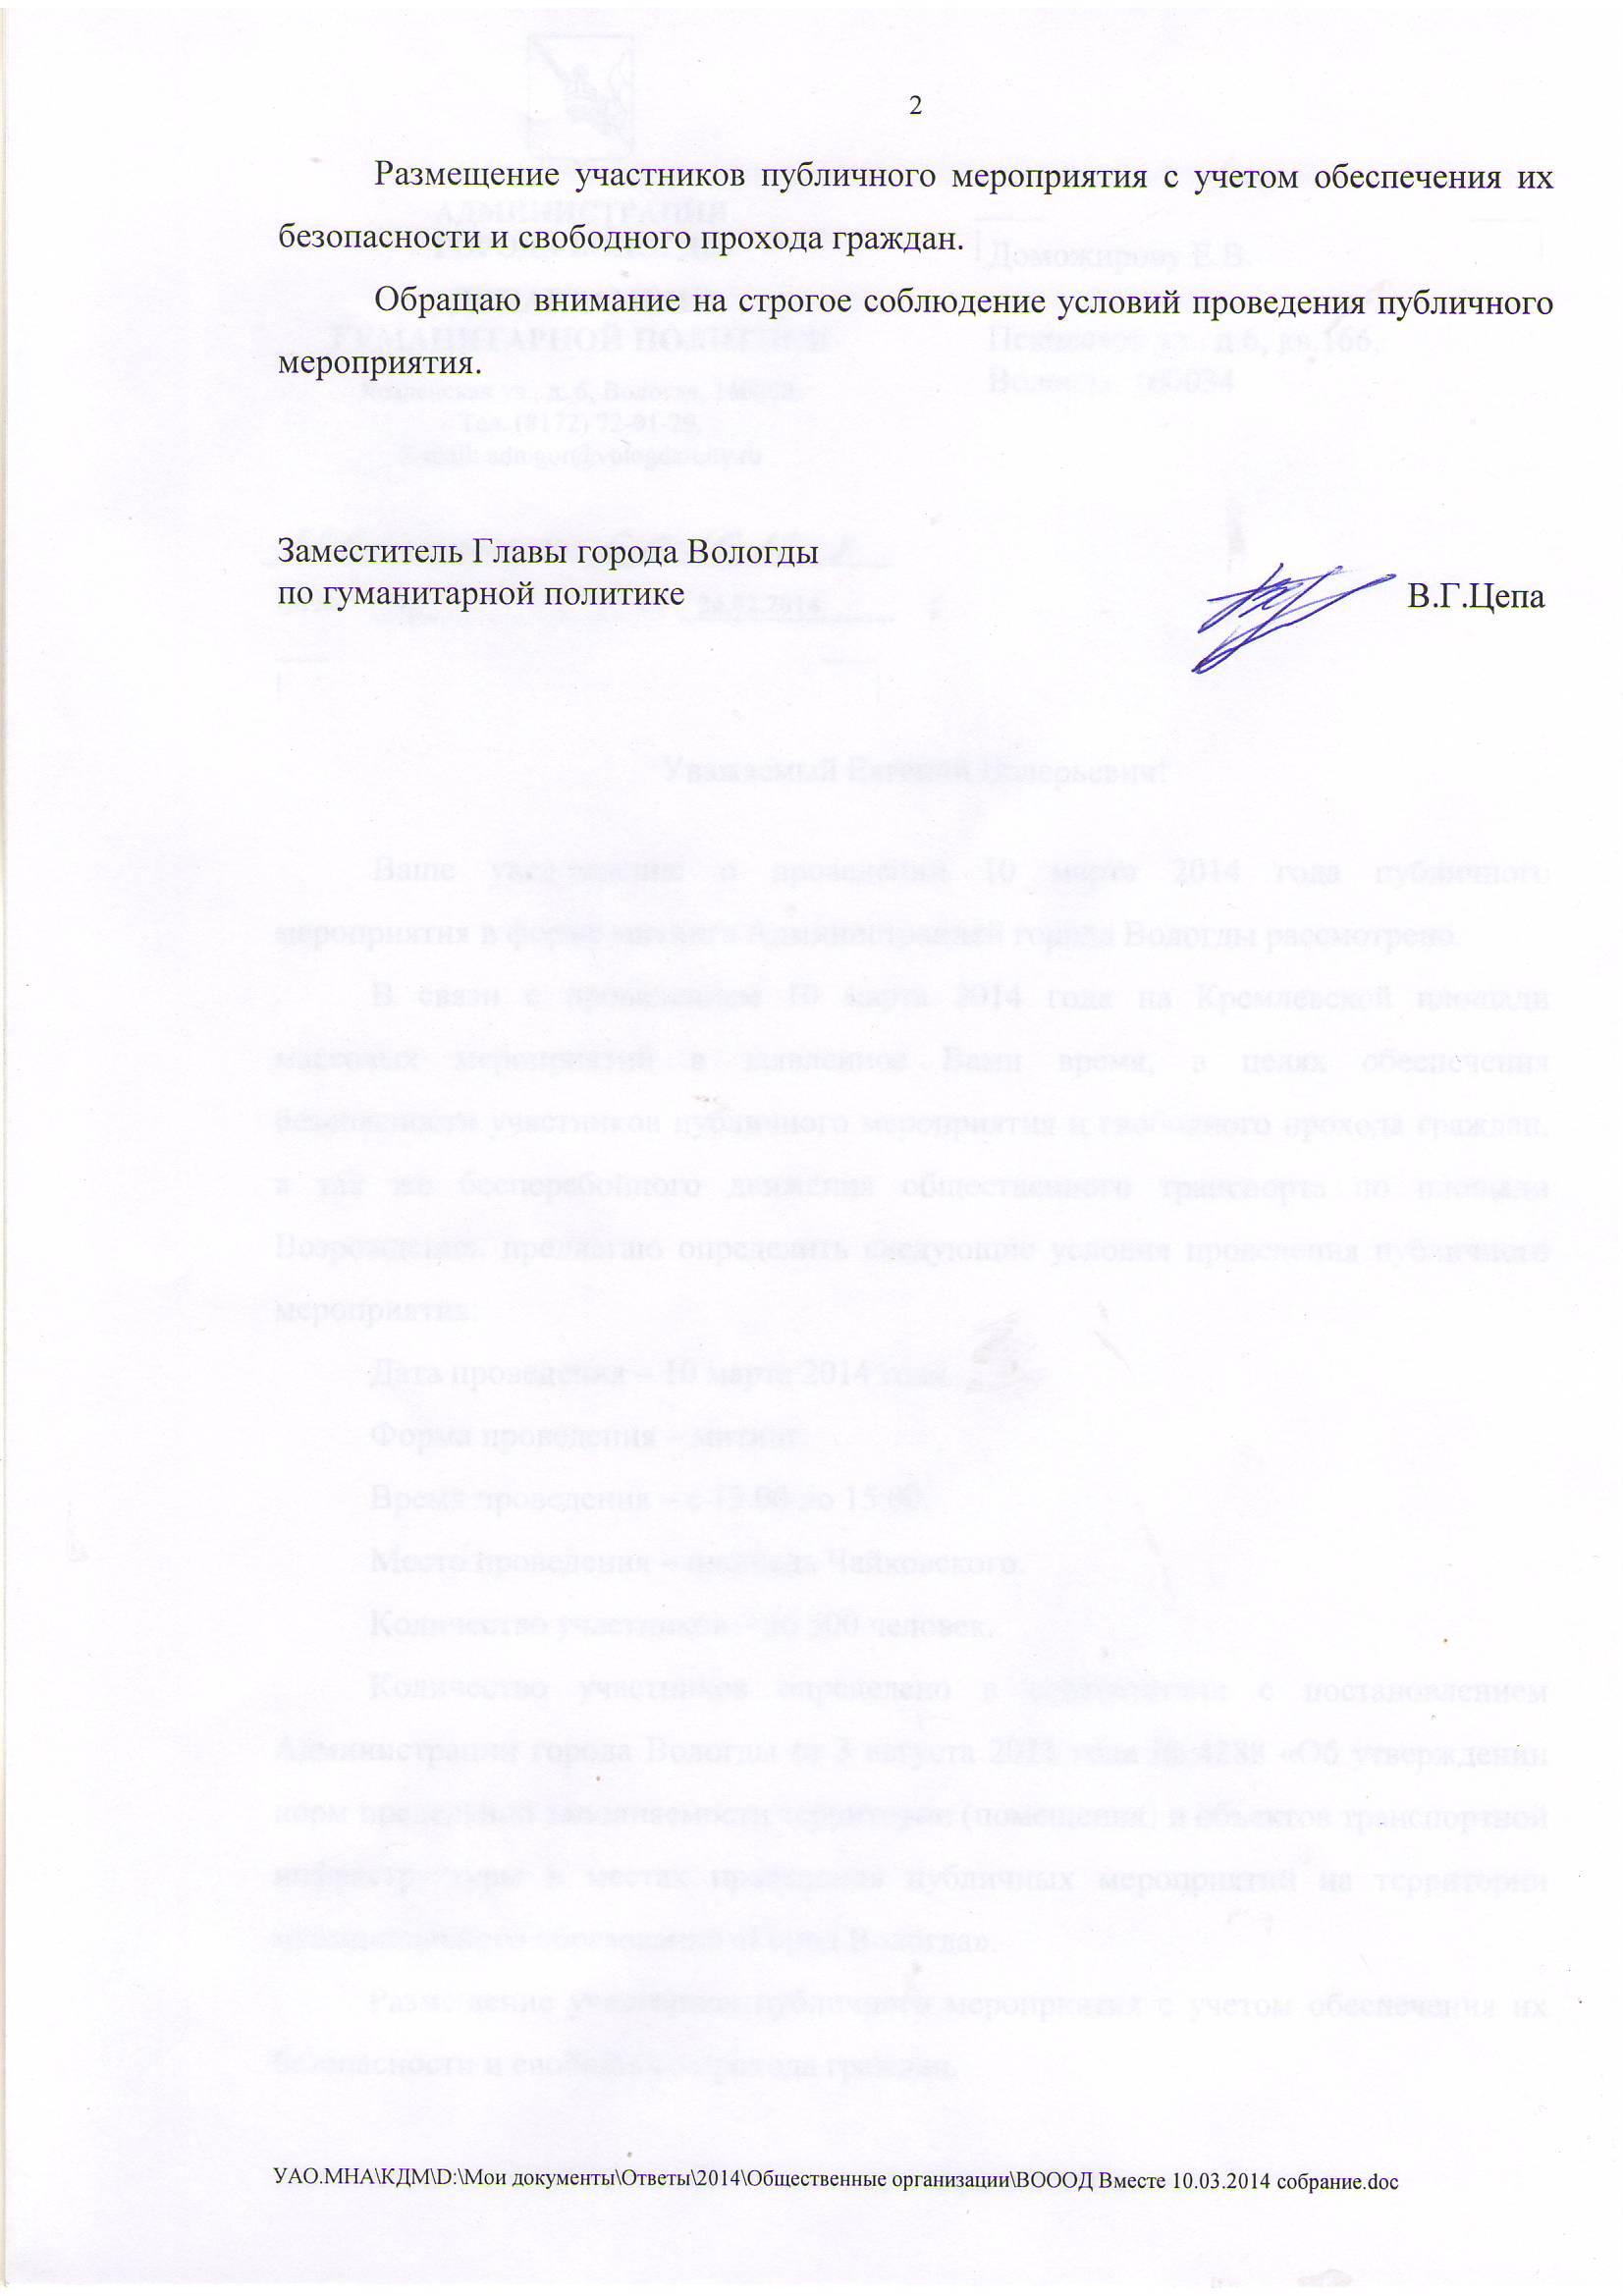 ответ по митигу 10 марта (2)